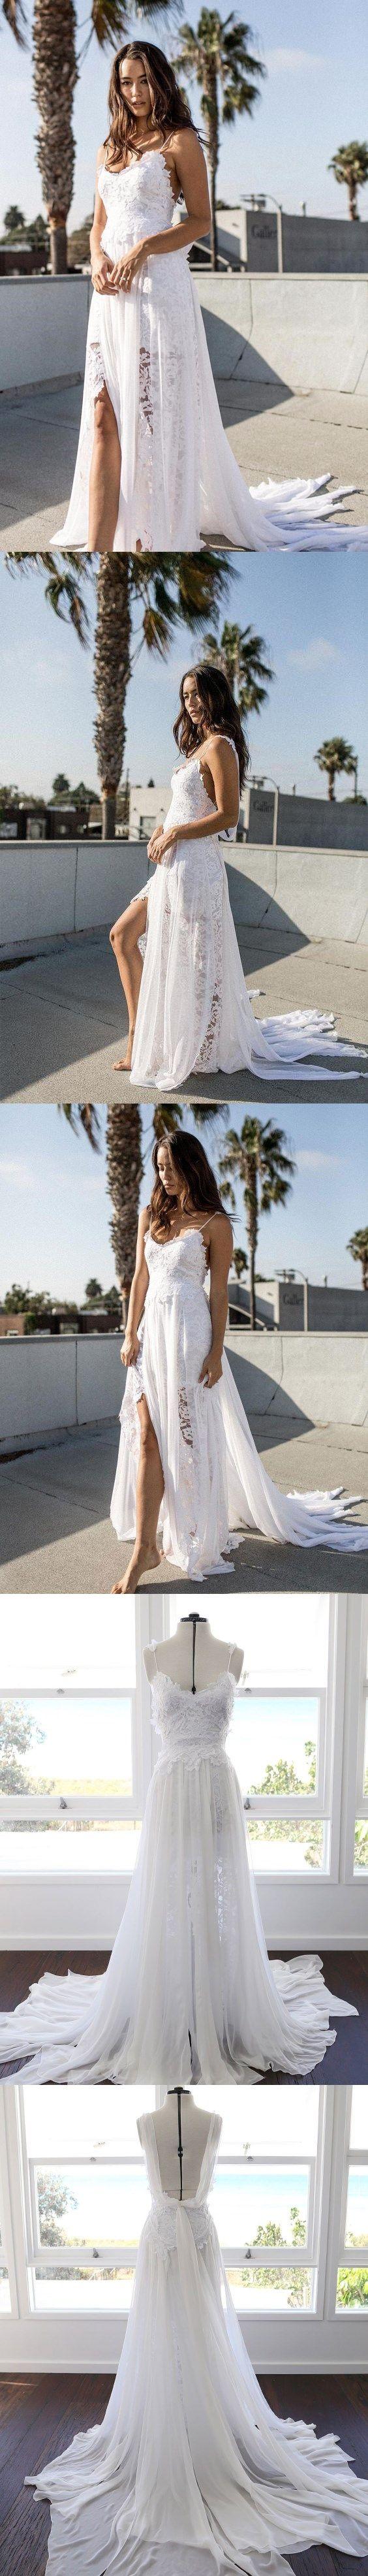 Open back wedding dresses spaghetti straps long train lace simple